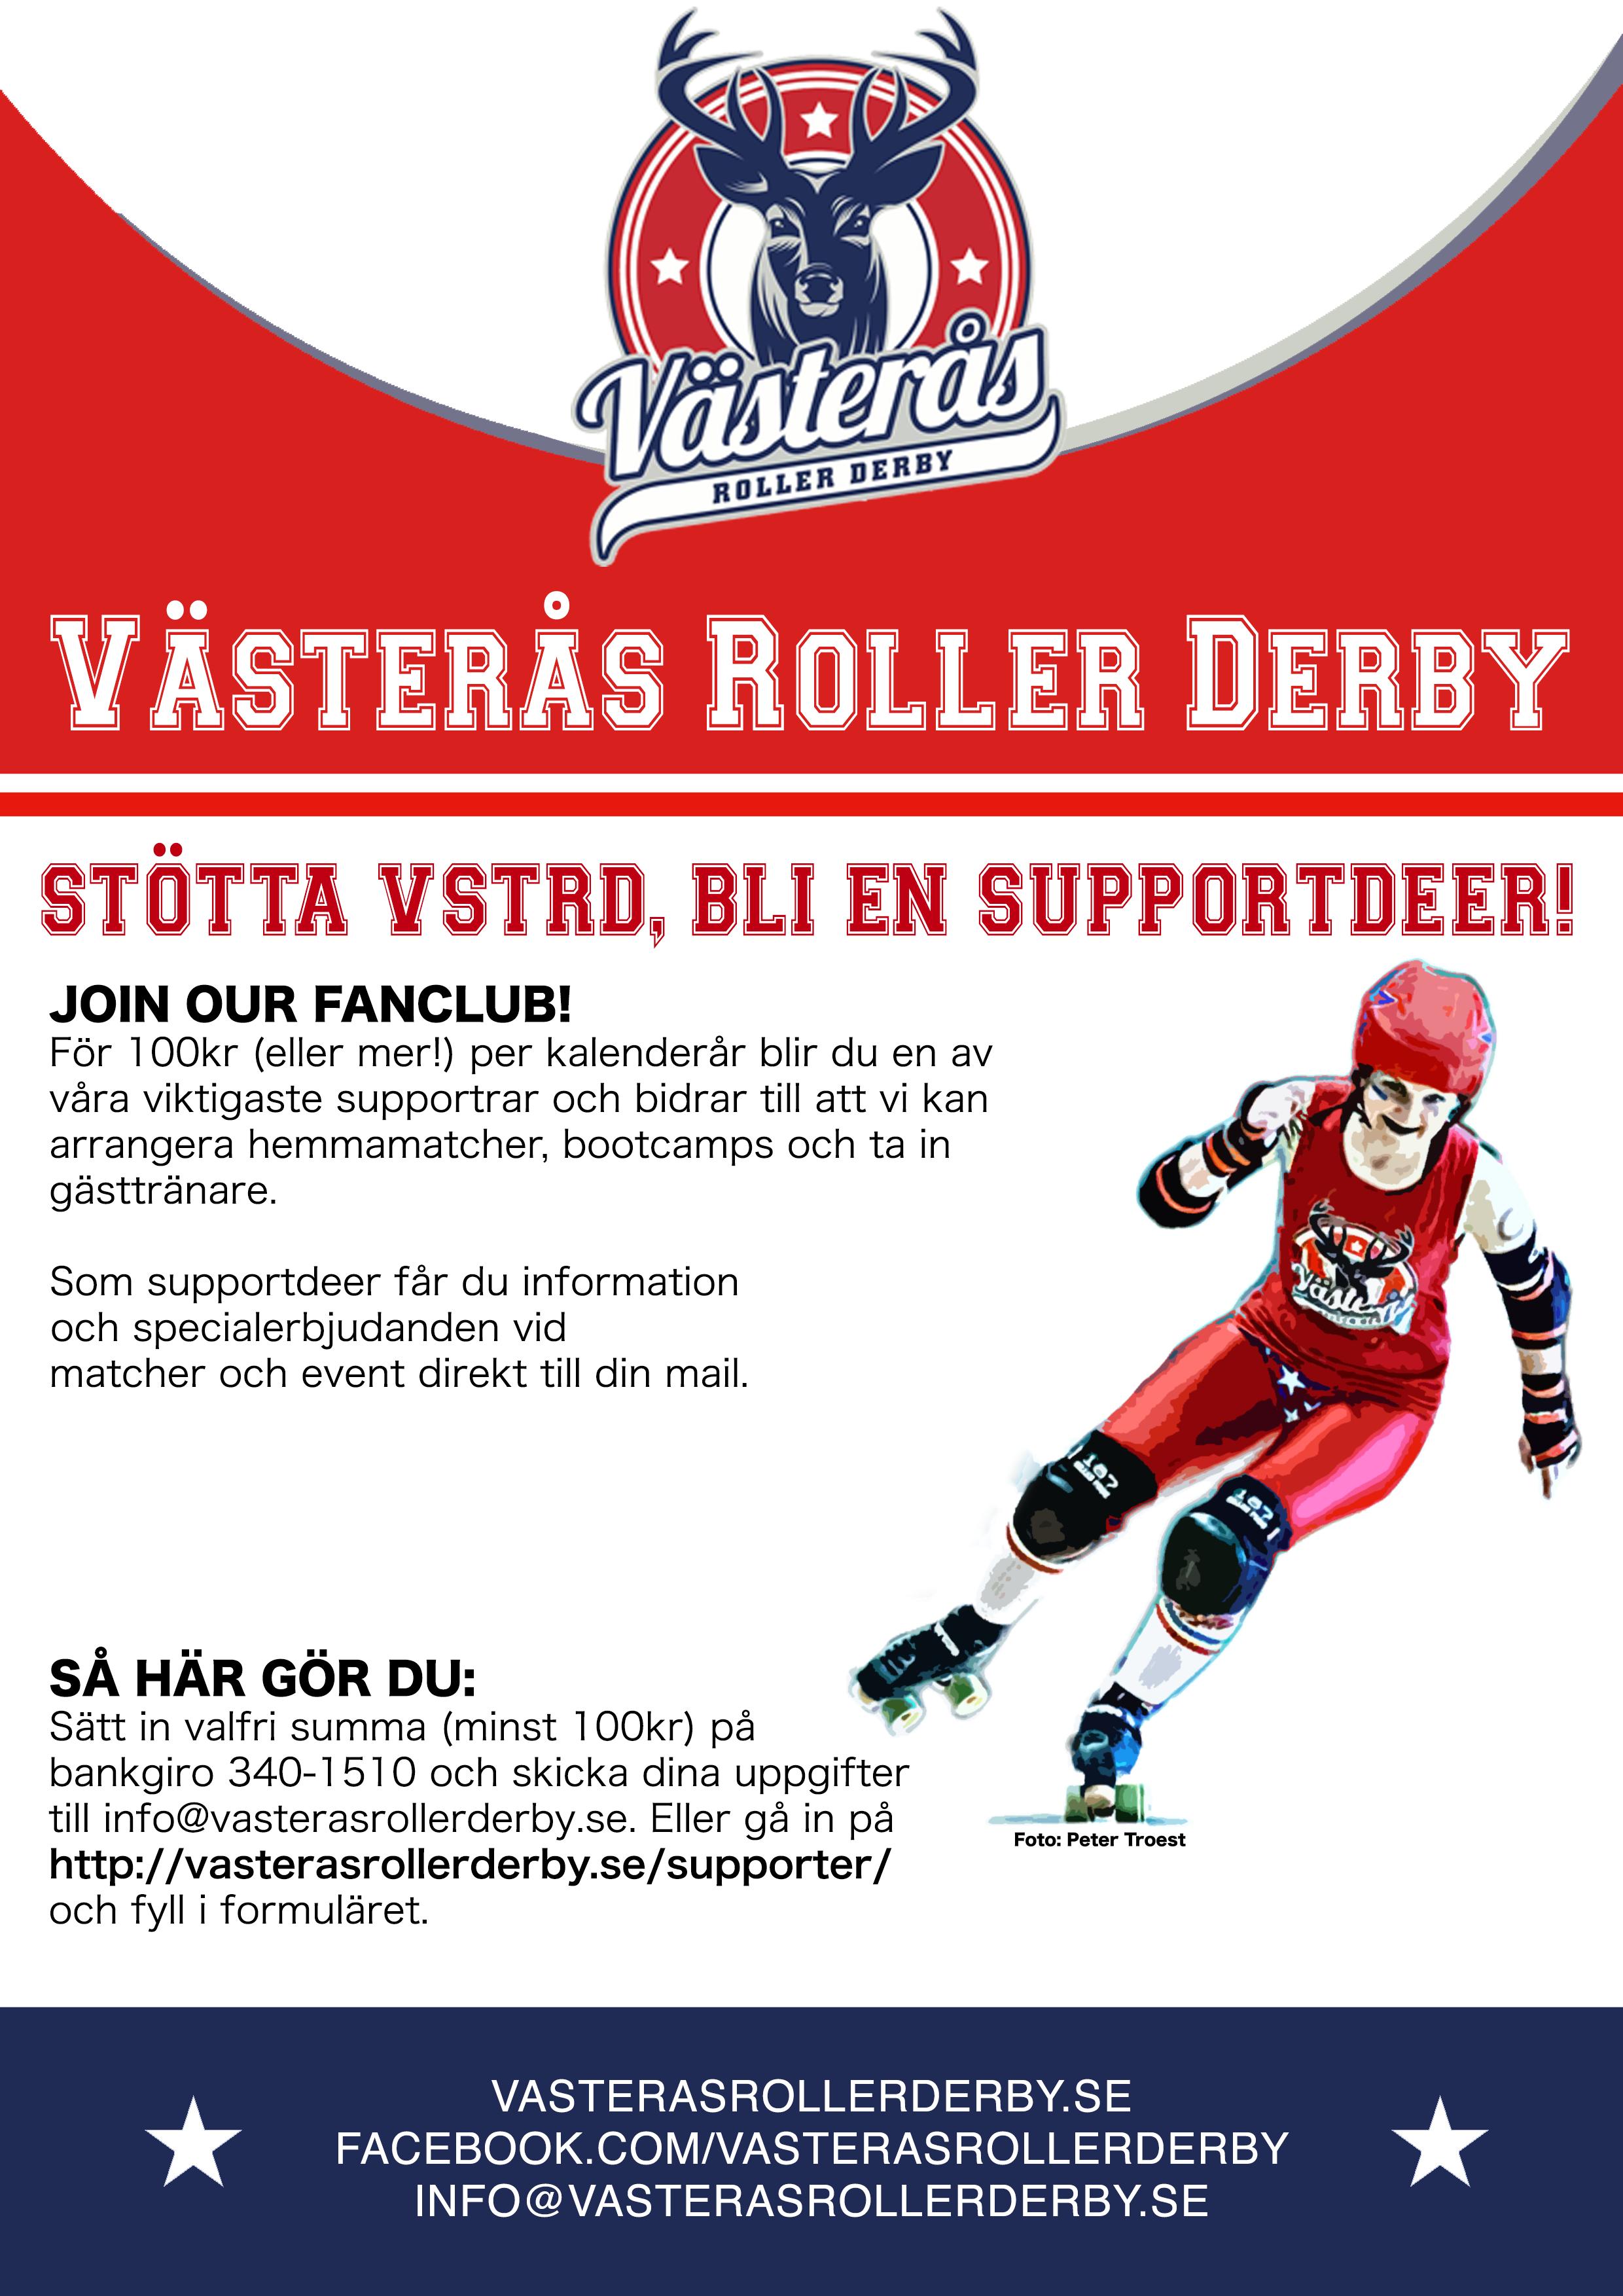 Become a SupportDeer for västerås roller derby!